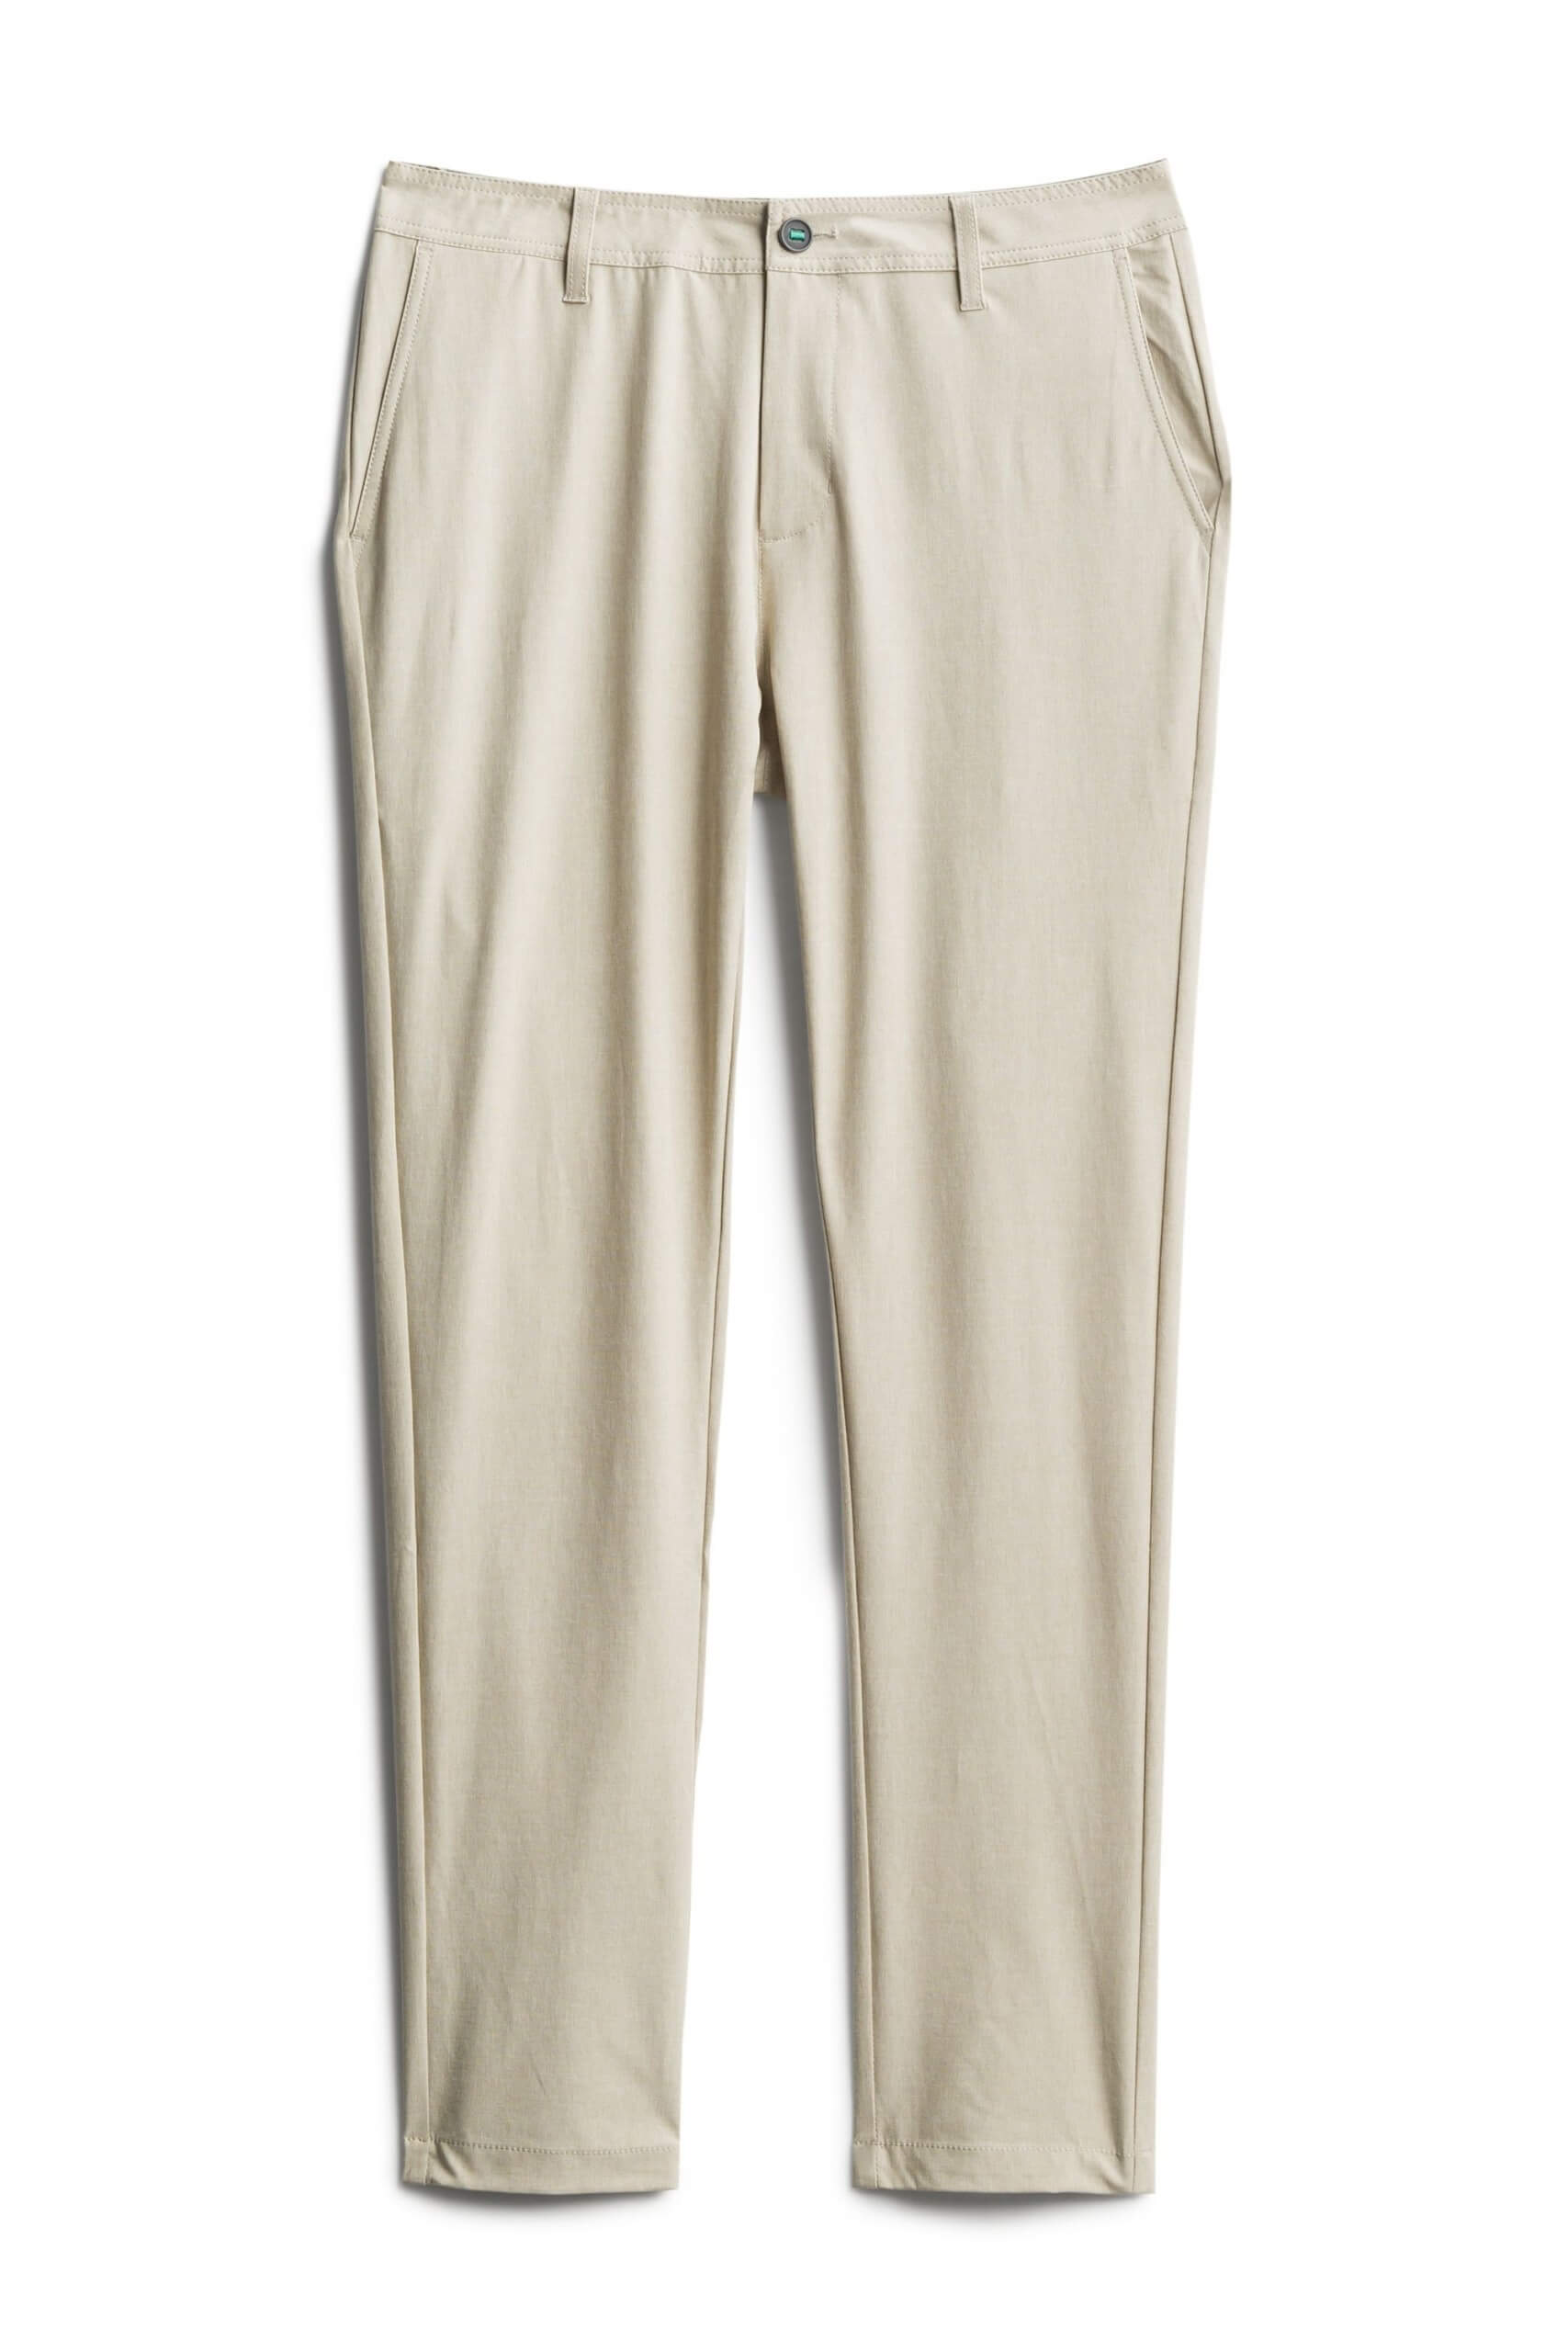 Stitch Fix Men's tan pants.